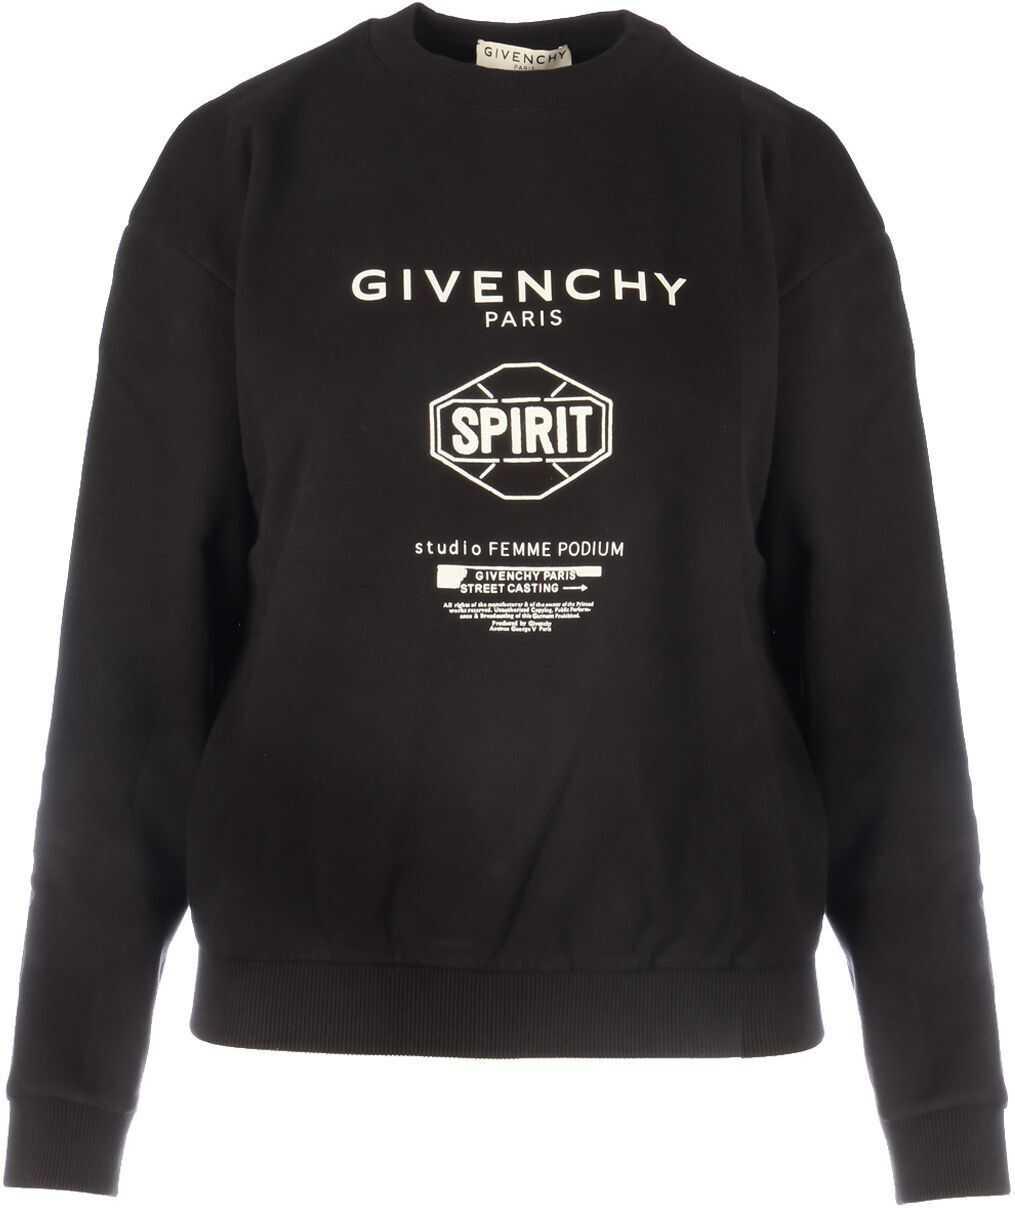 Givenchy Cotton Sweatshirt BLACK